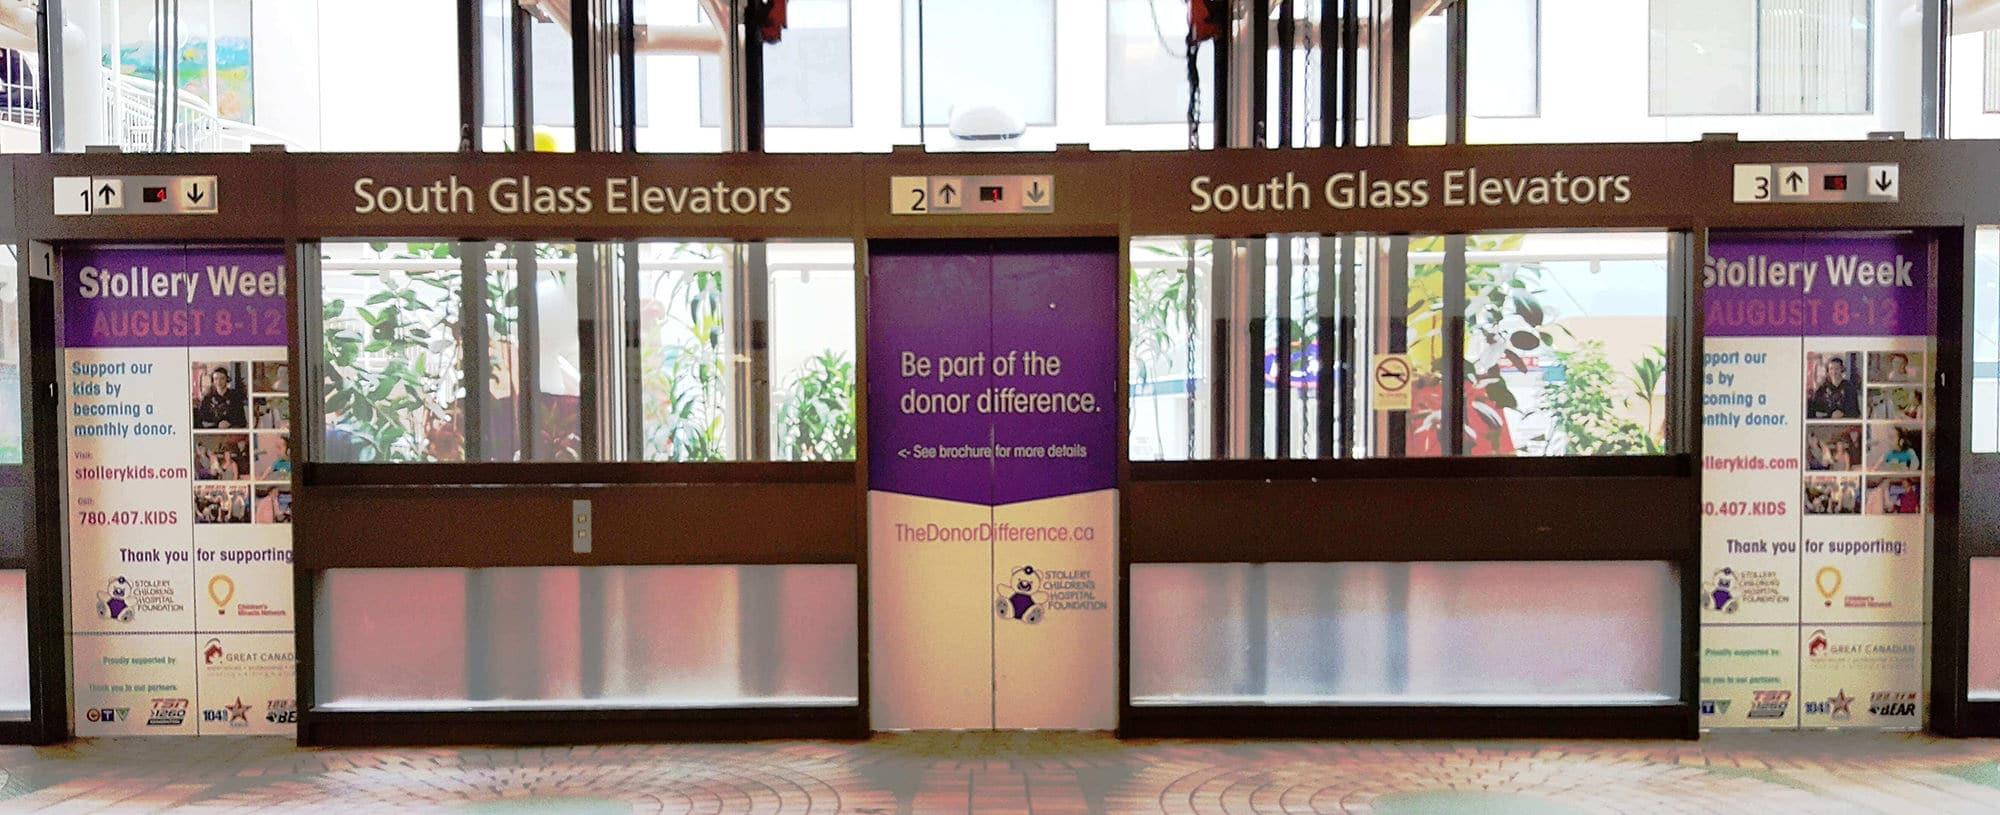 stollery-elevator-wrap-2